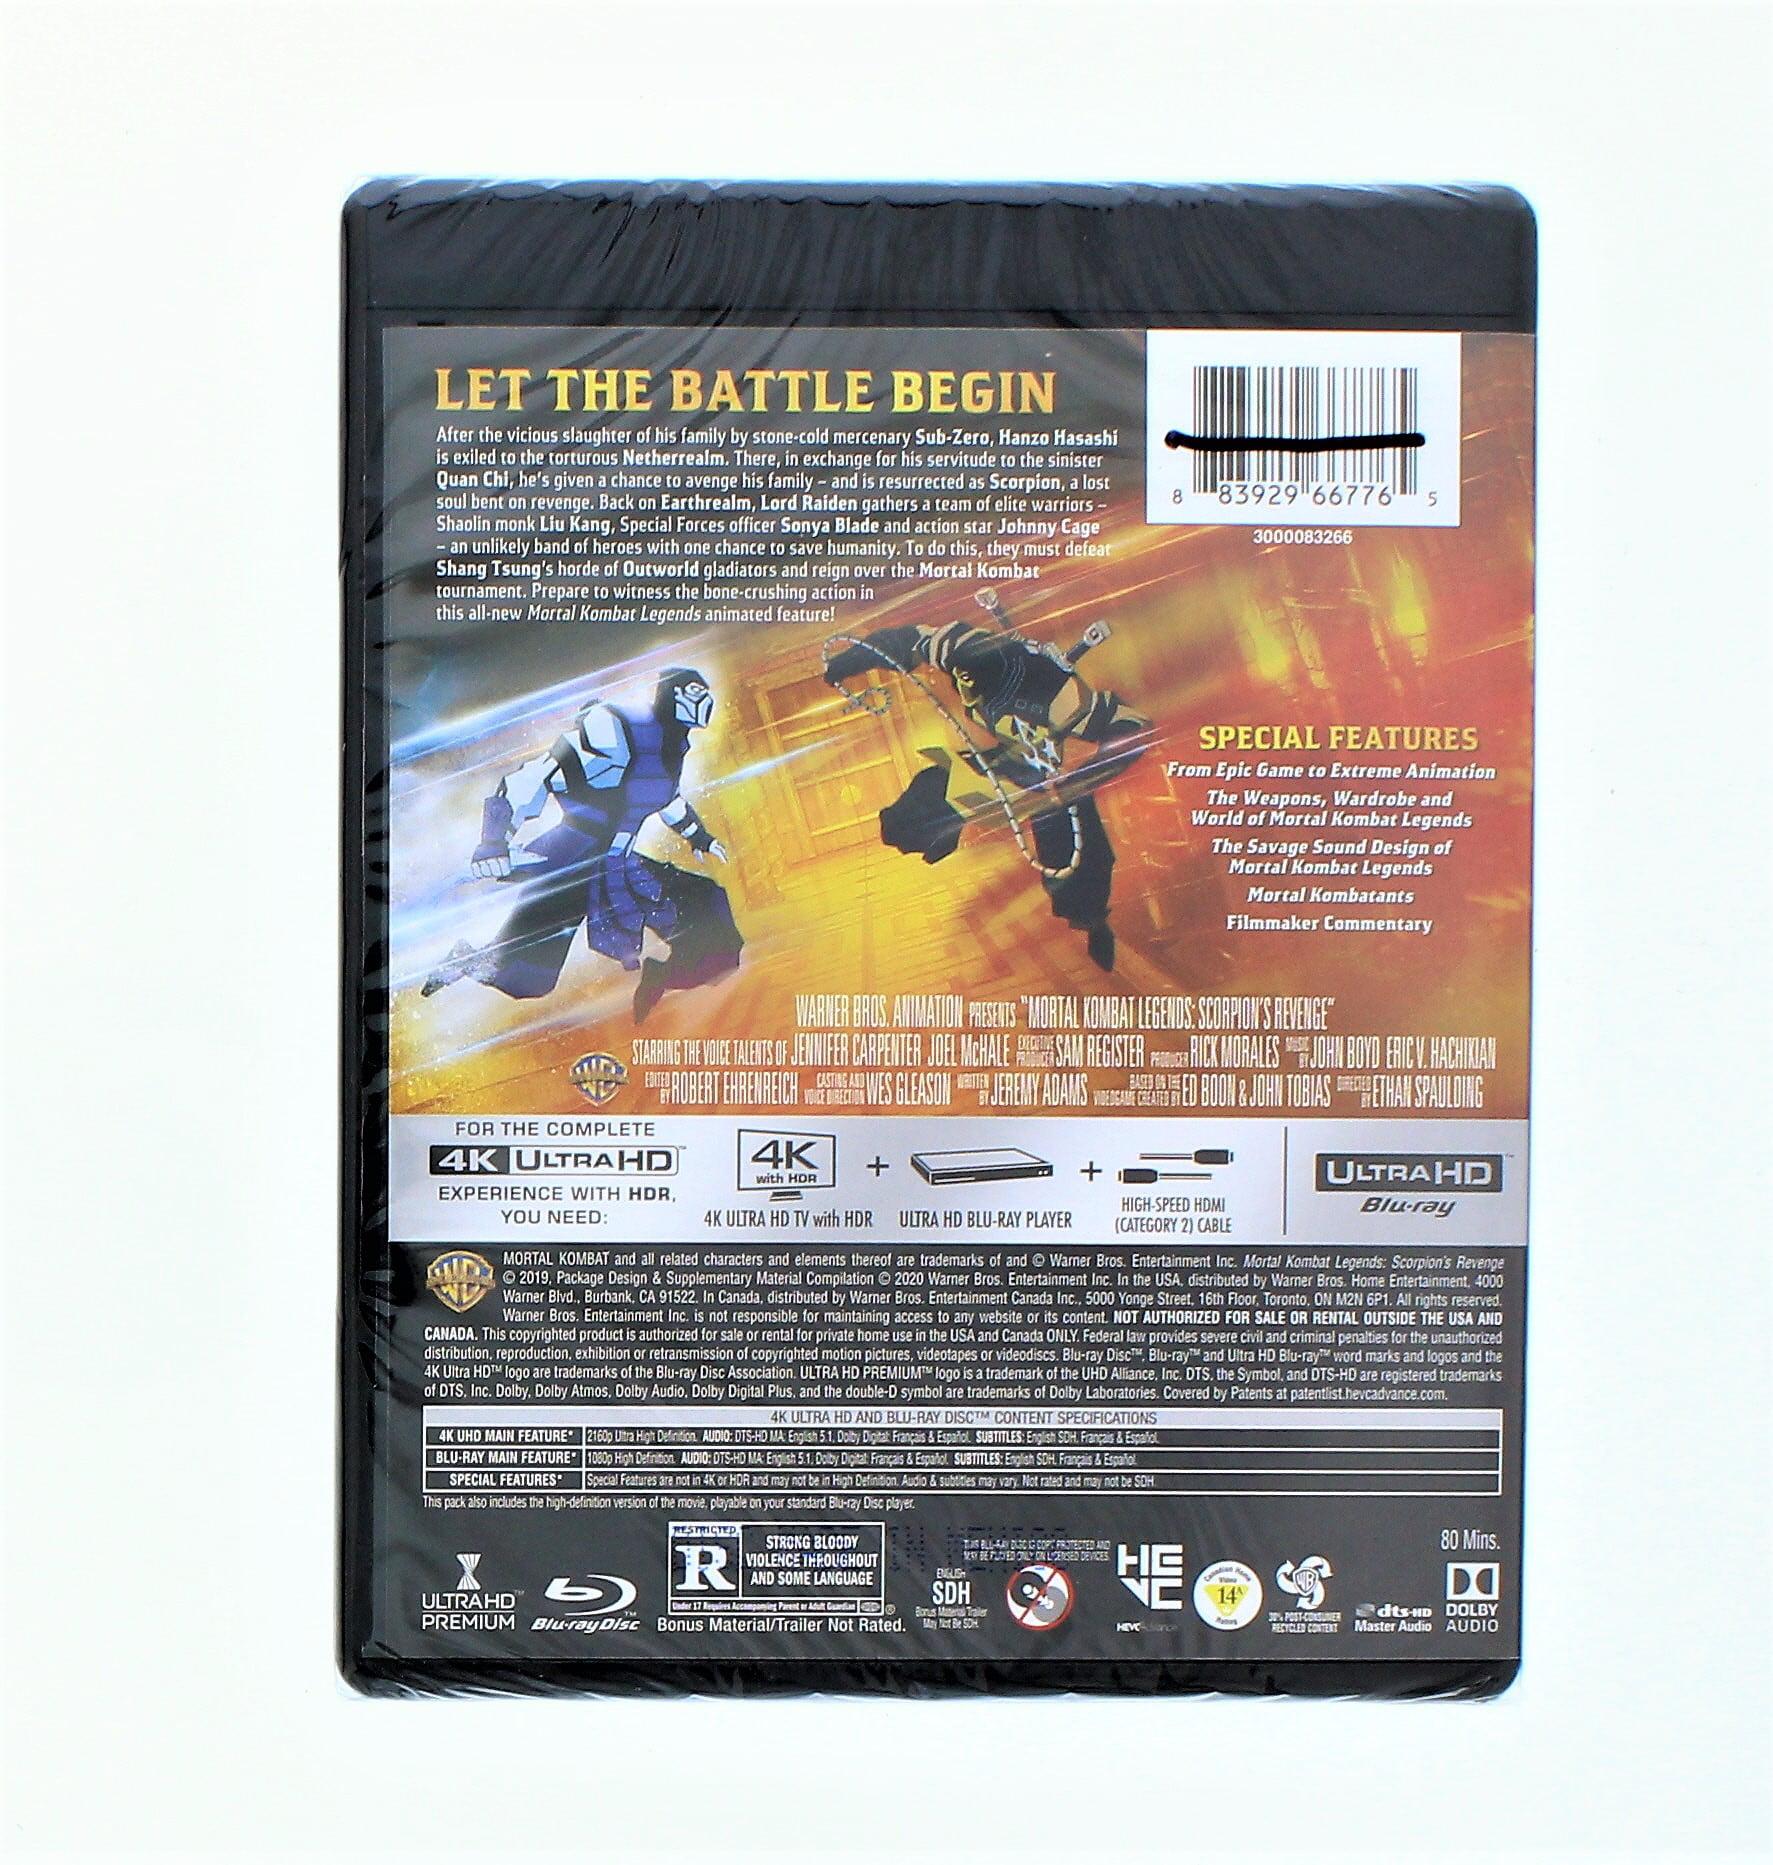 Mortal Kombat Legends Scorpion S Revenge 4k Ultra Hd Blu Ray